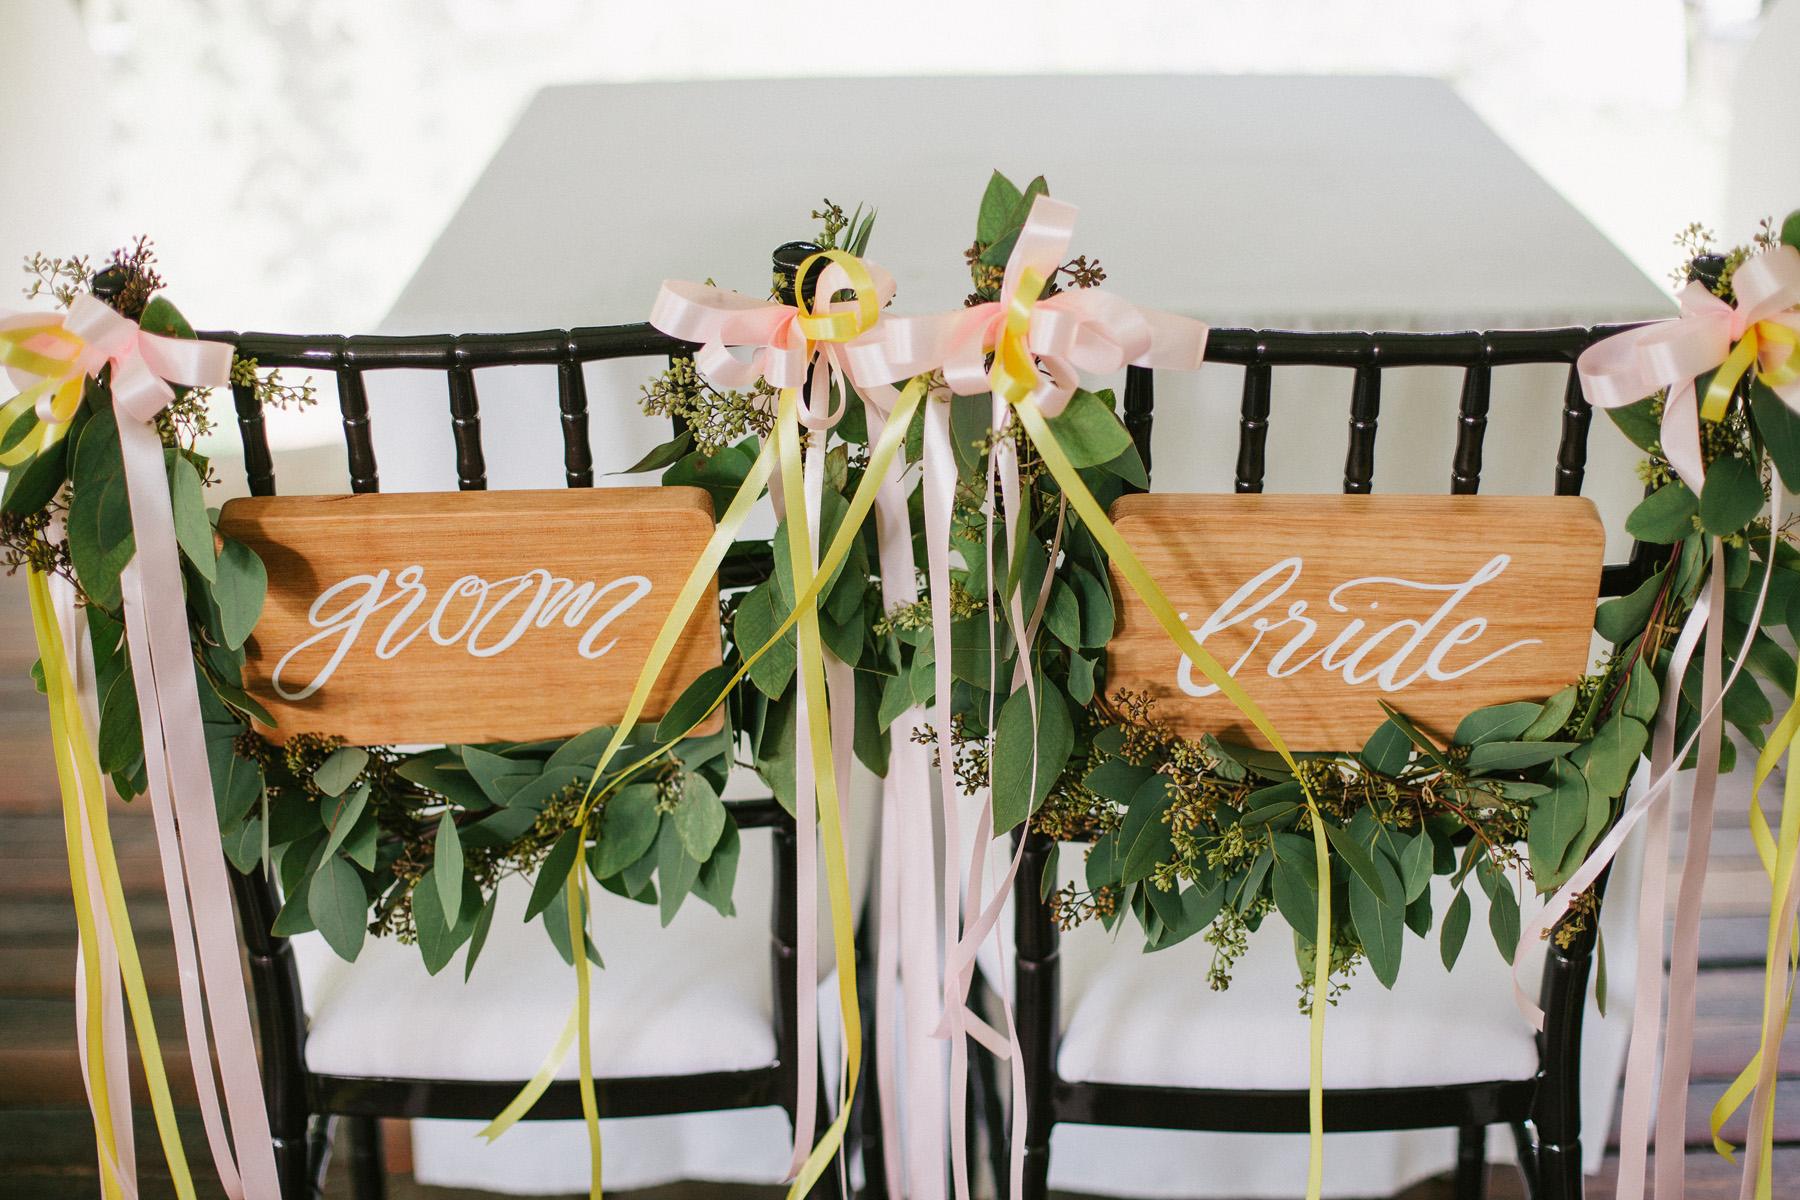 singapore-wedding-travel-photographer-faith-alvin-wedding-wmt-22.jpg